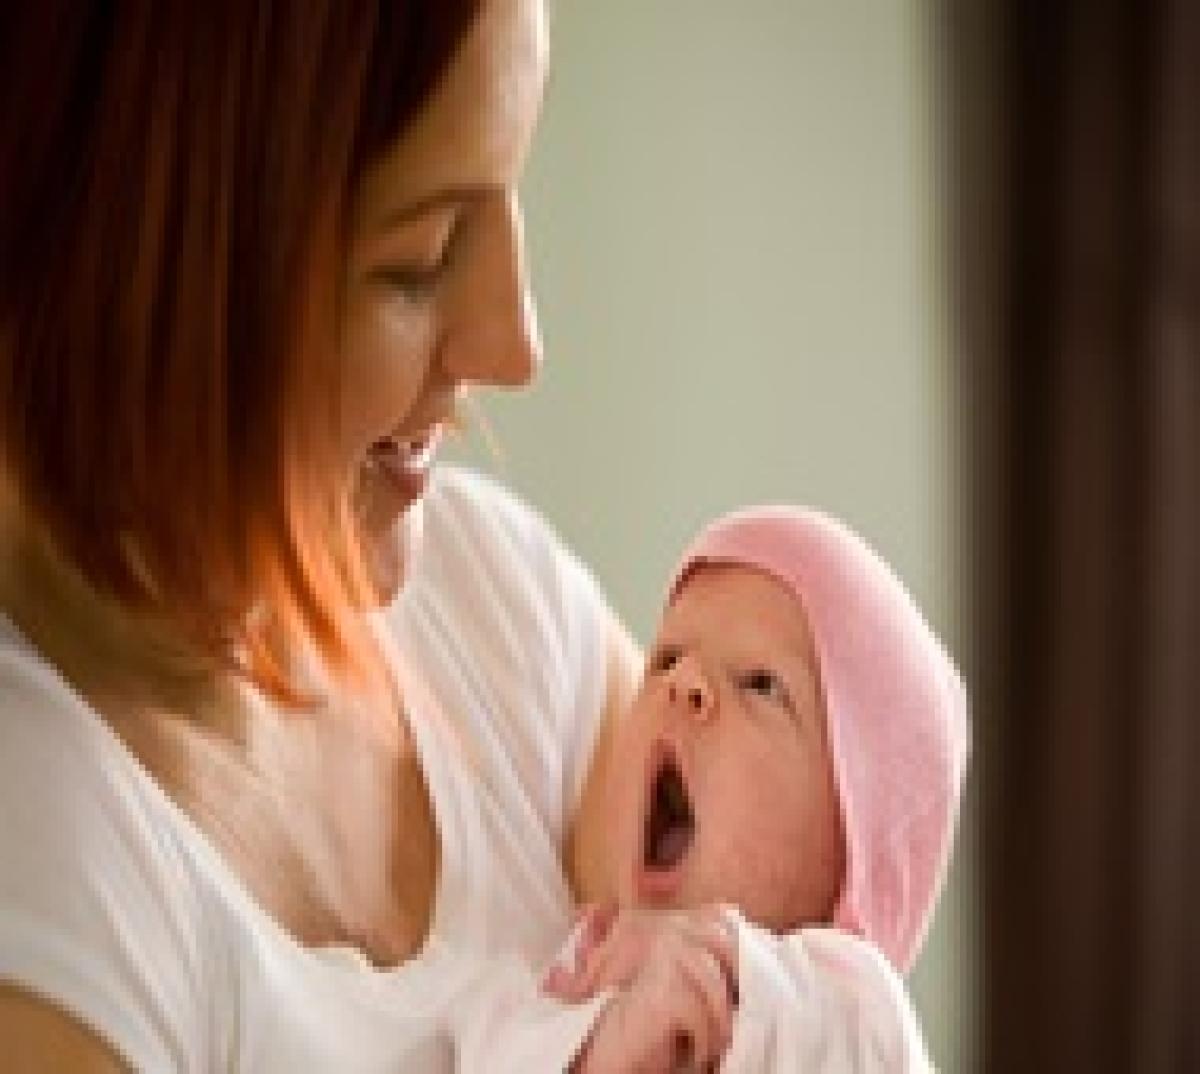 Late motherhood through IVF: Boon or curse